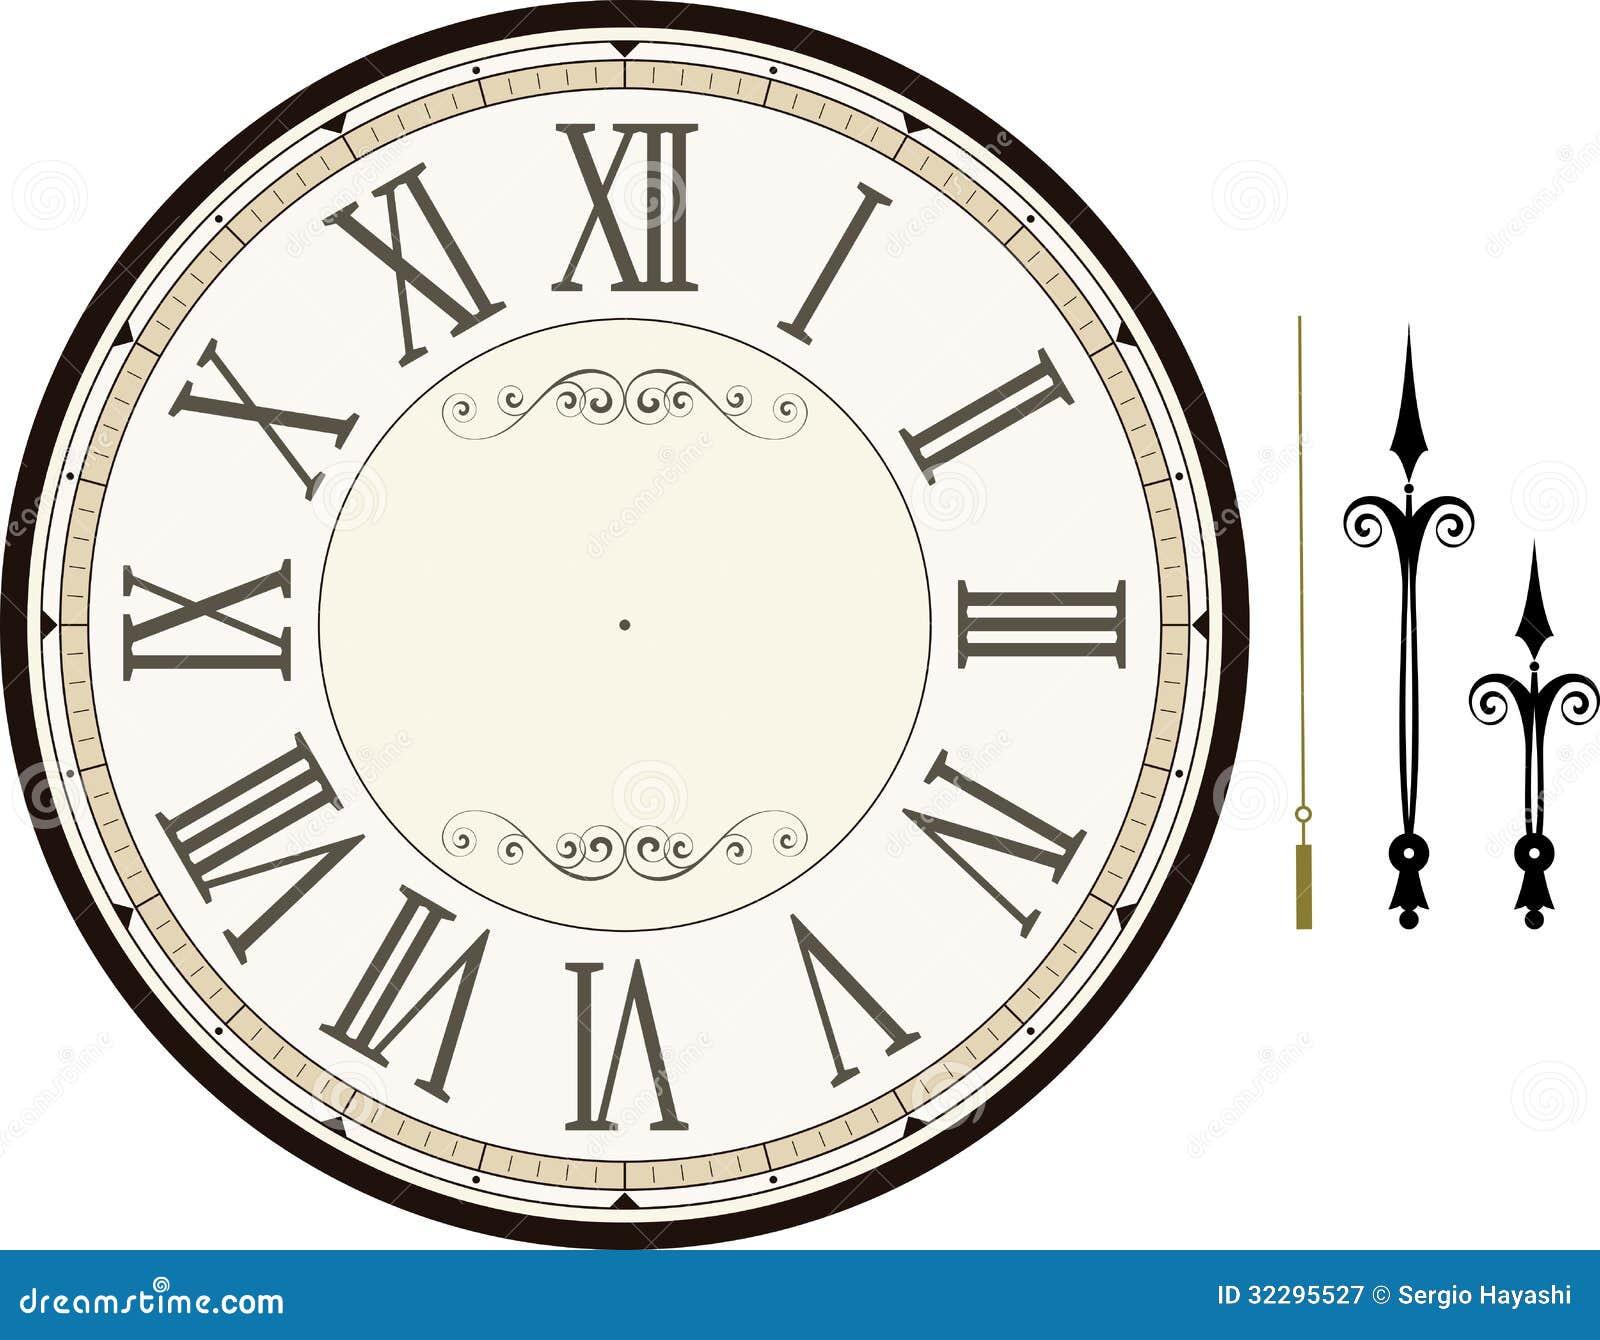 Blank Clock Face Clipart Vintage clock face template